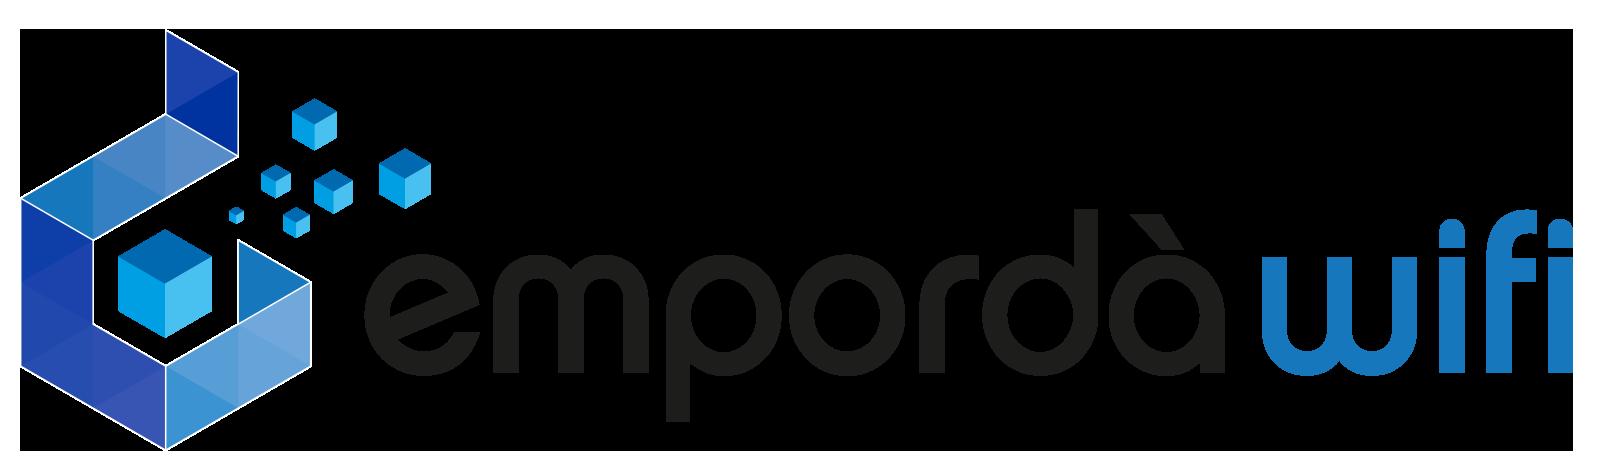 Empordà Wifi Logo